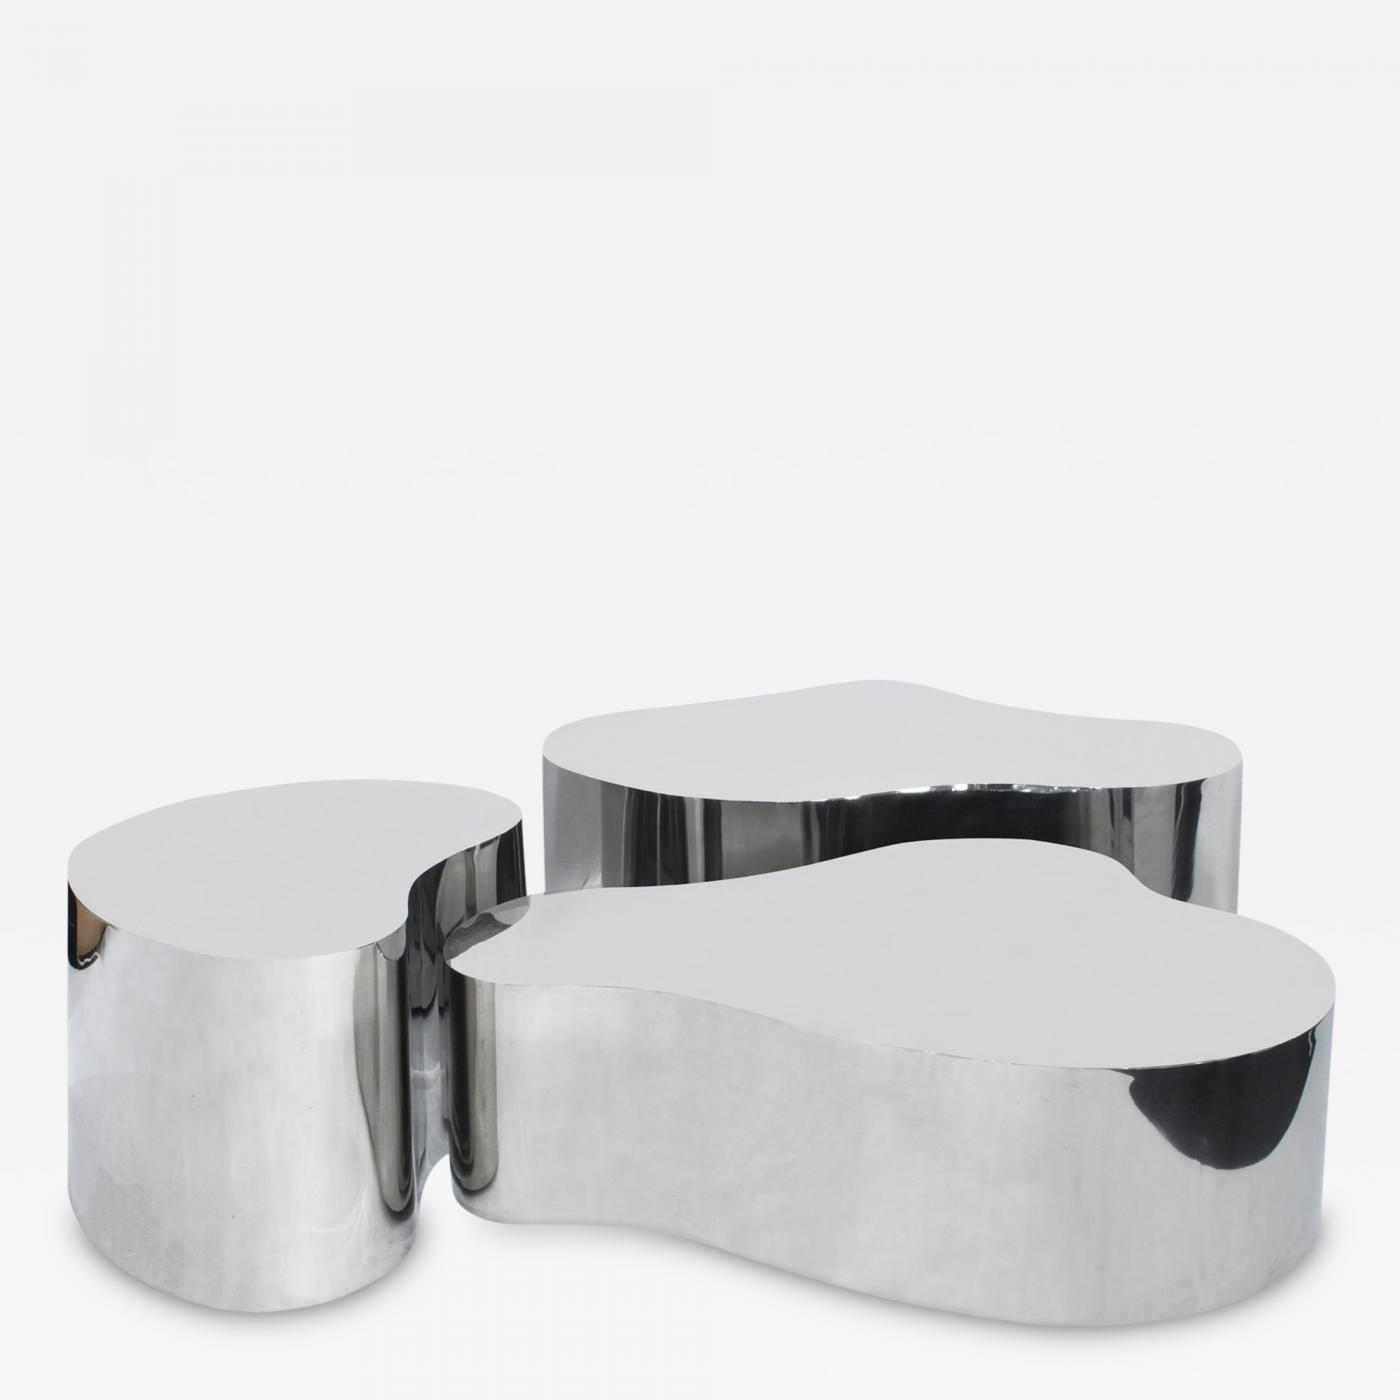 Listings / Furniture / Tables / Coffee Tables · Karl Springer ...